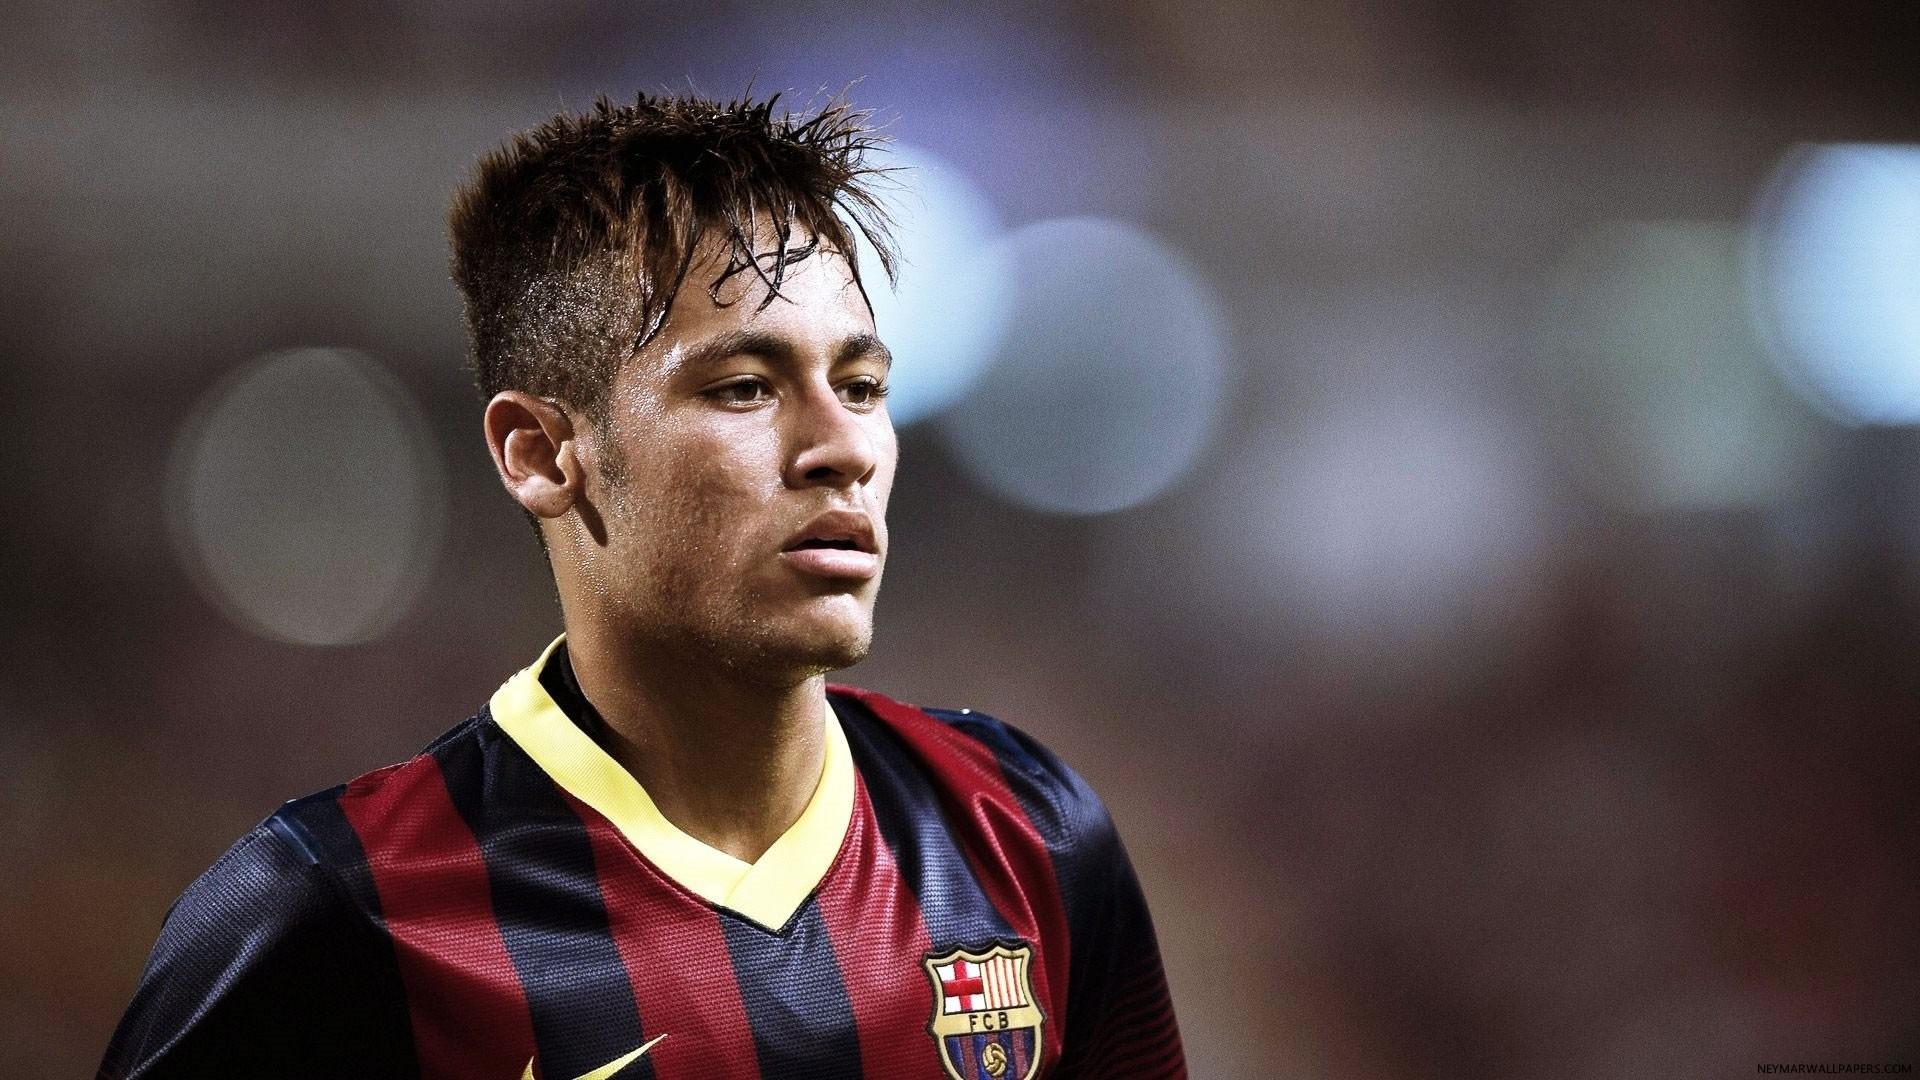 Neymar Jr Free Wallpaper